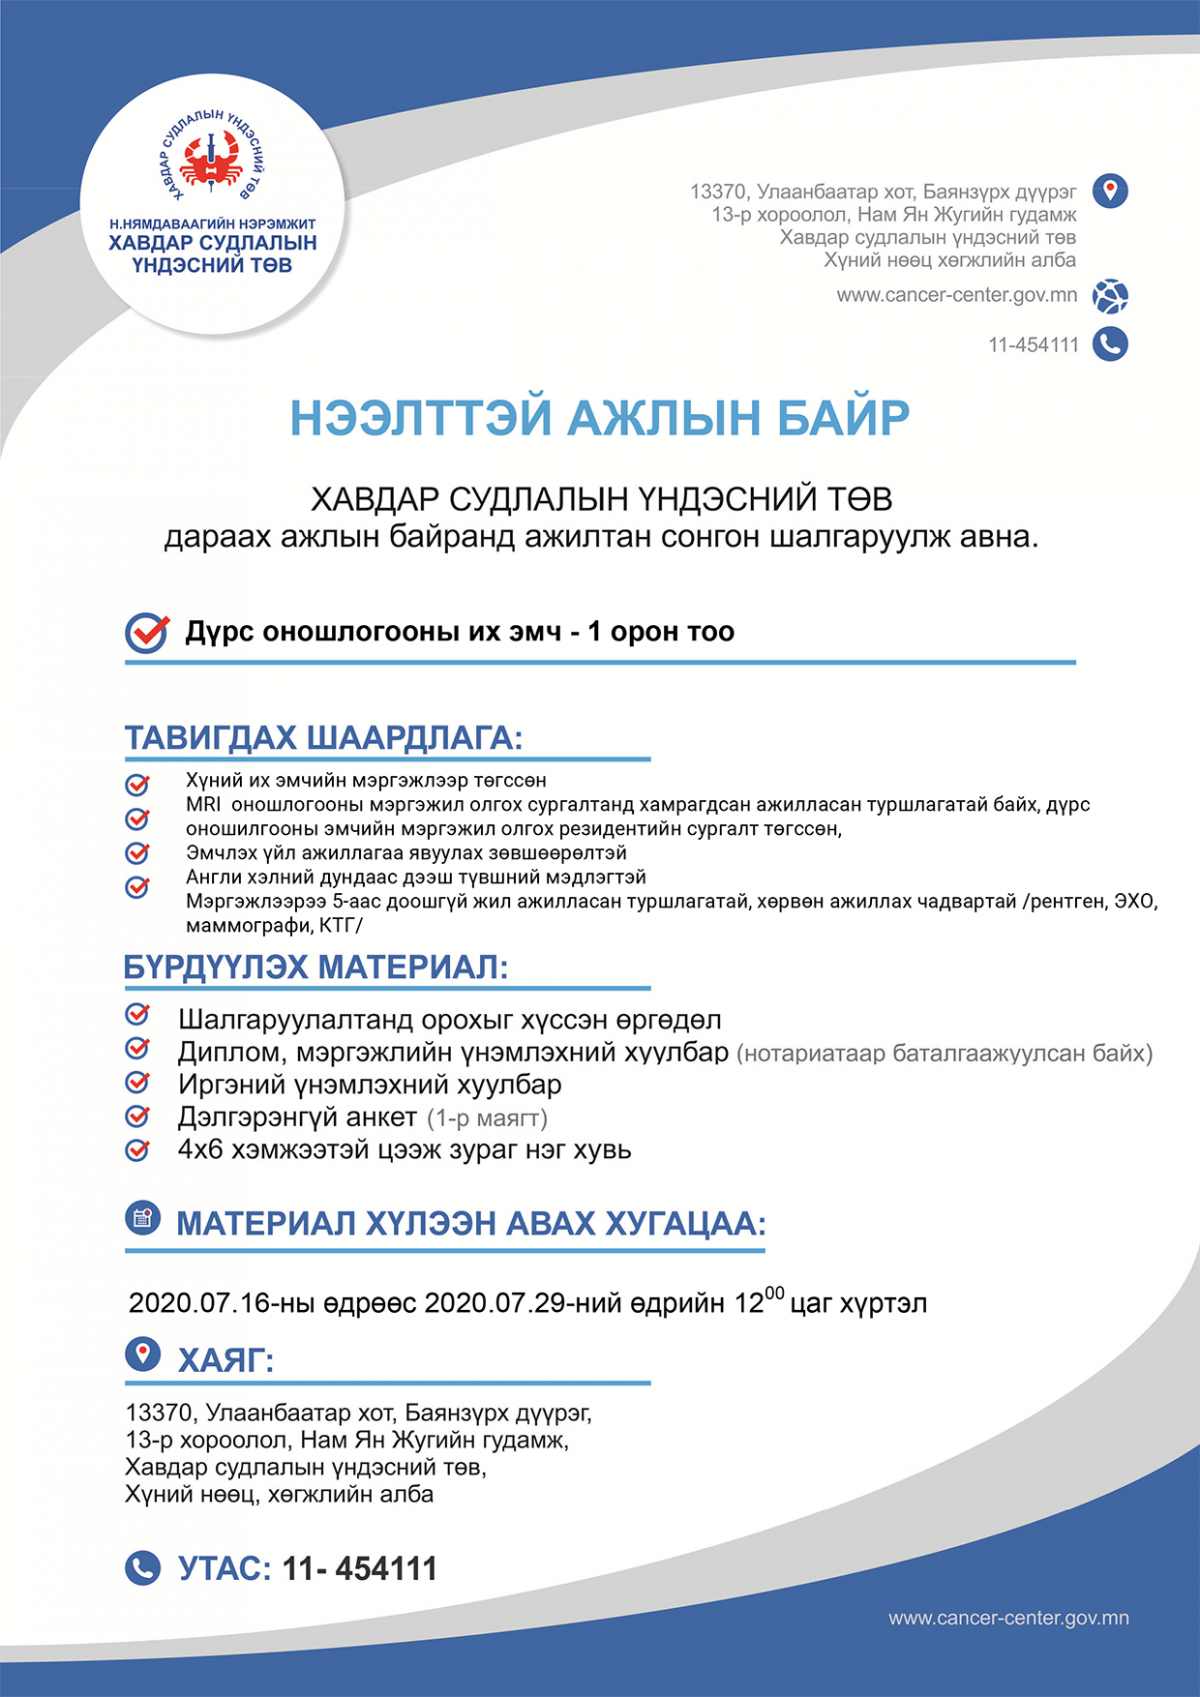 zar-2-1200x1697.png